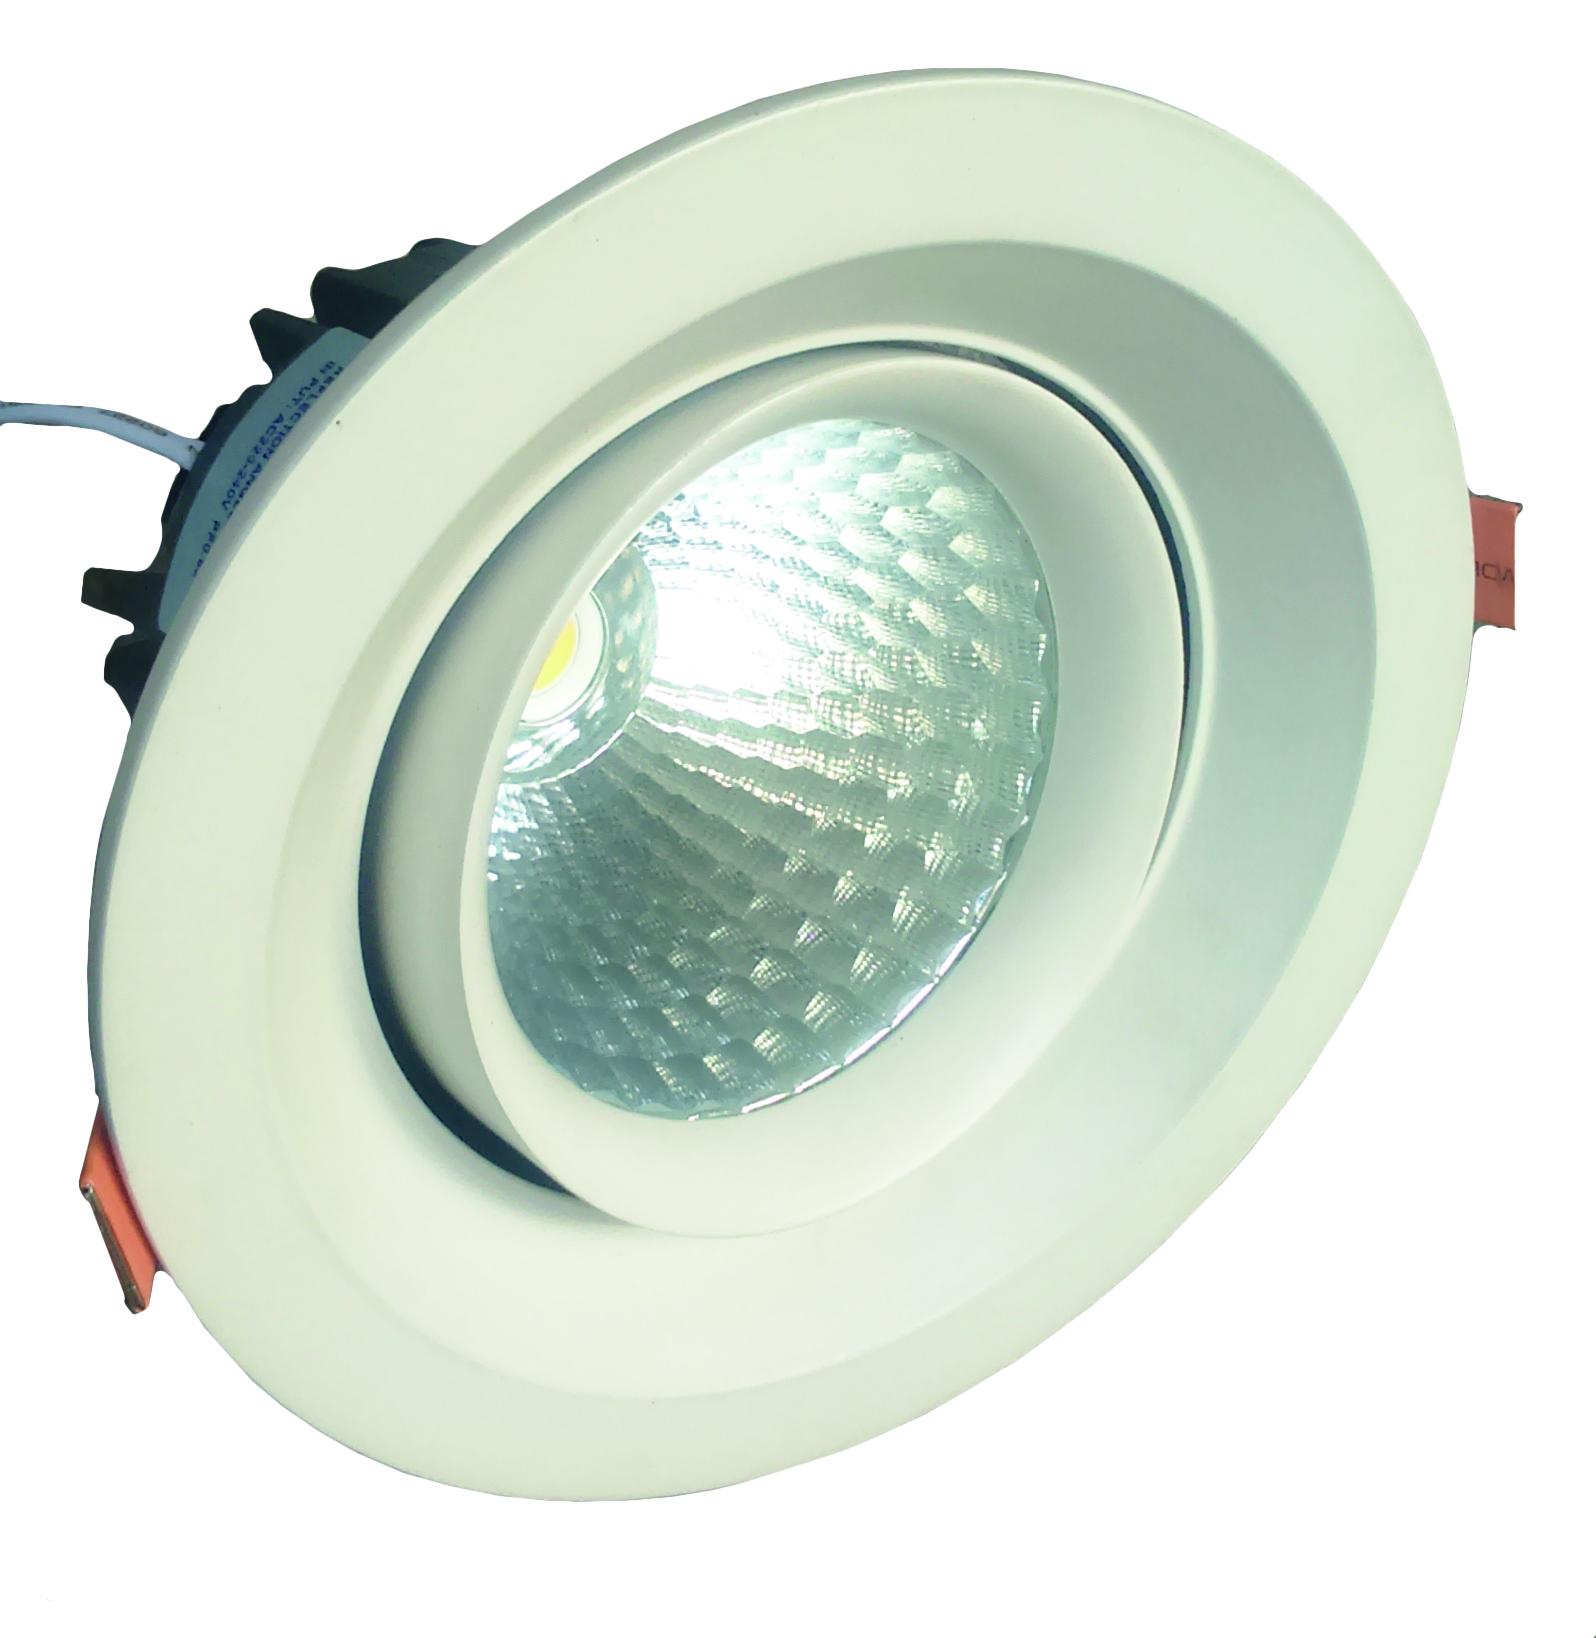 Foco LED Embutido Basculante 35W